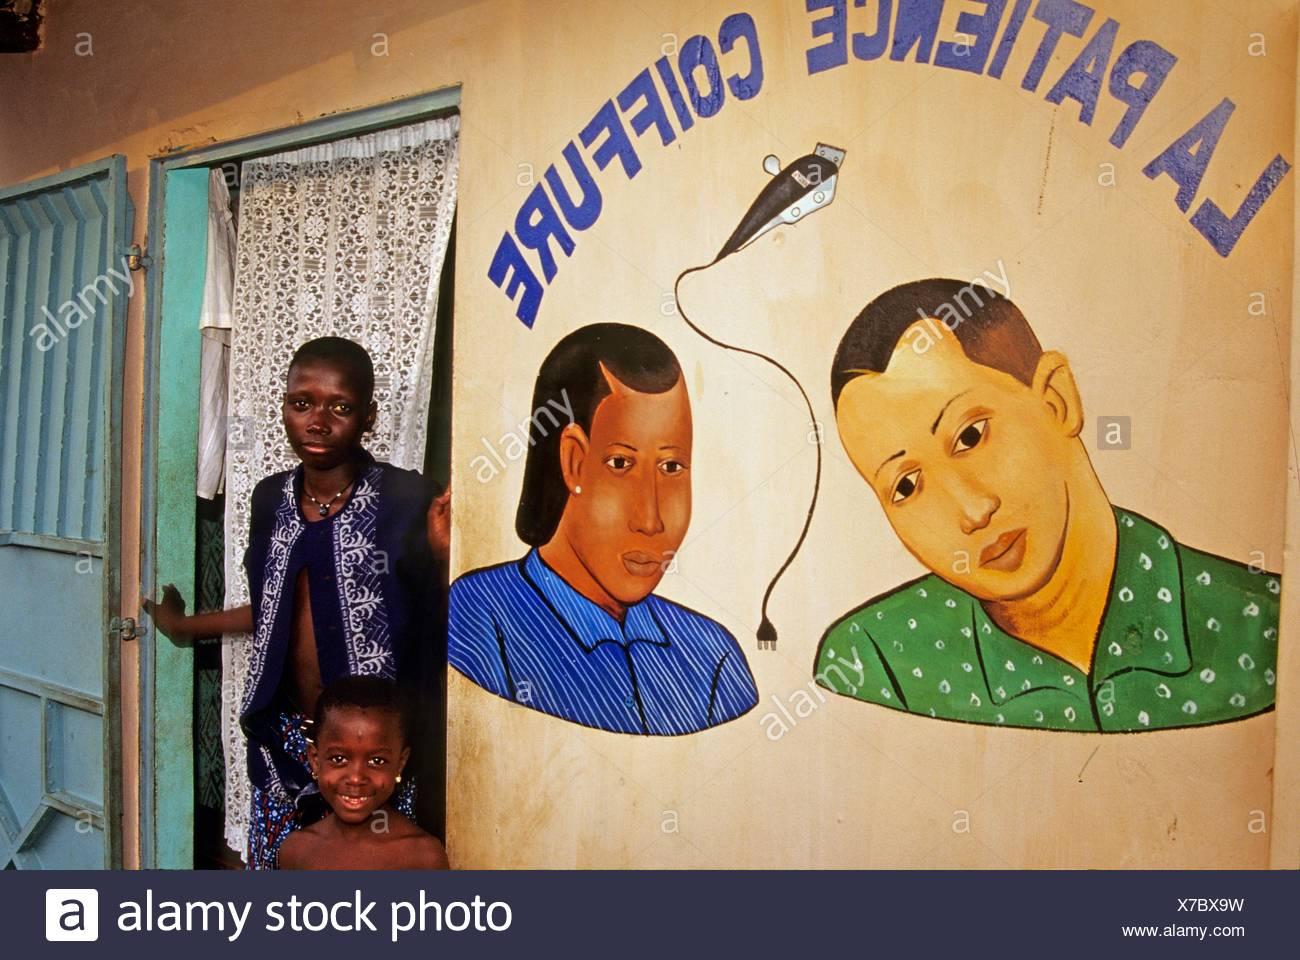 Salon de Coiffure, Friseursalon, Hair Salon, Benin, Golfe de ...